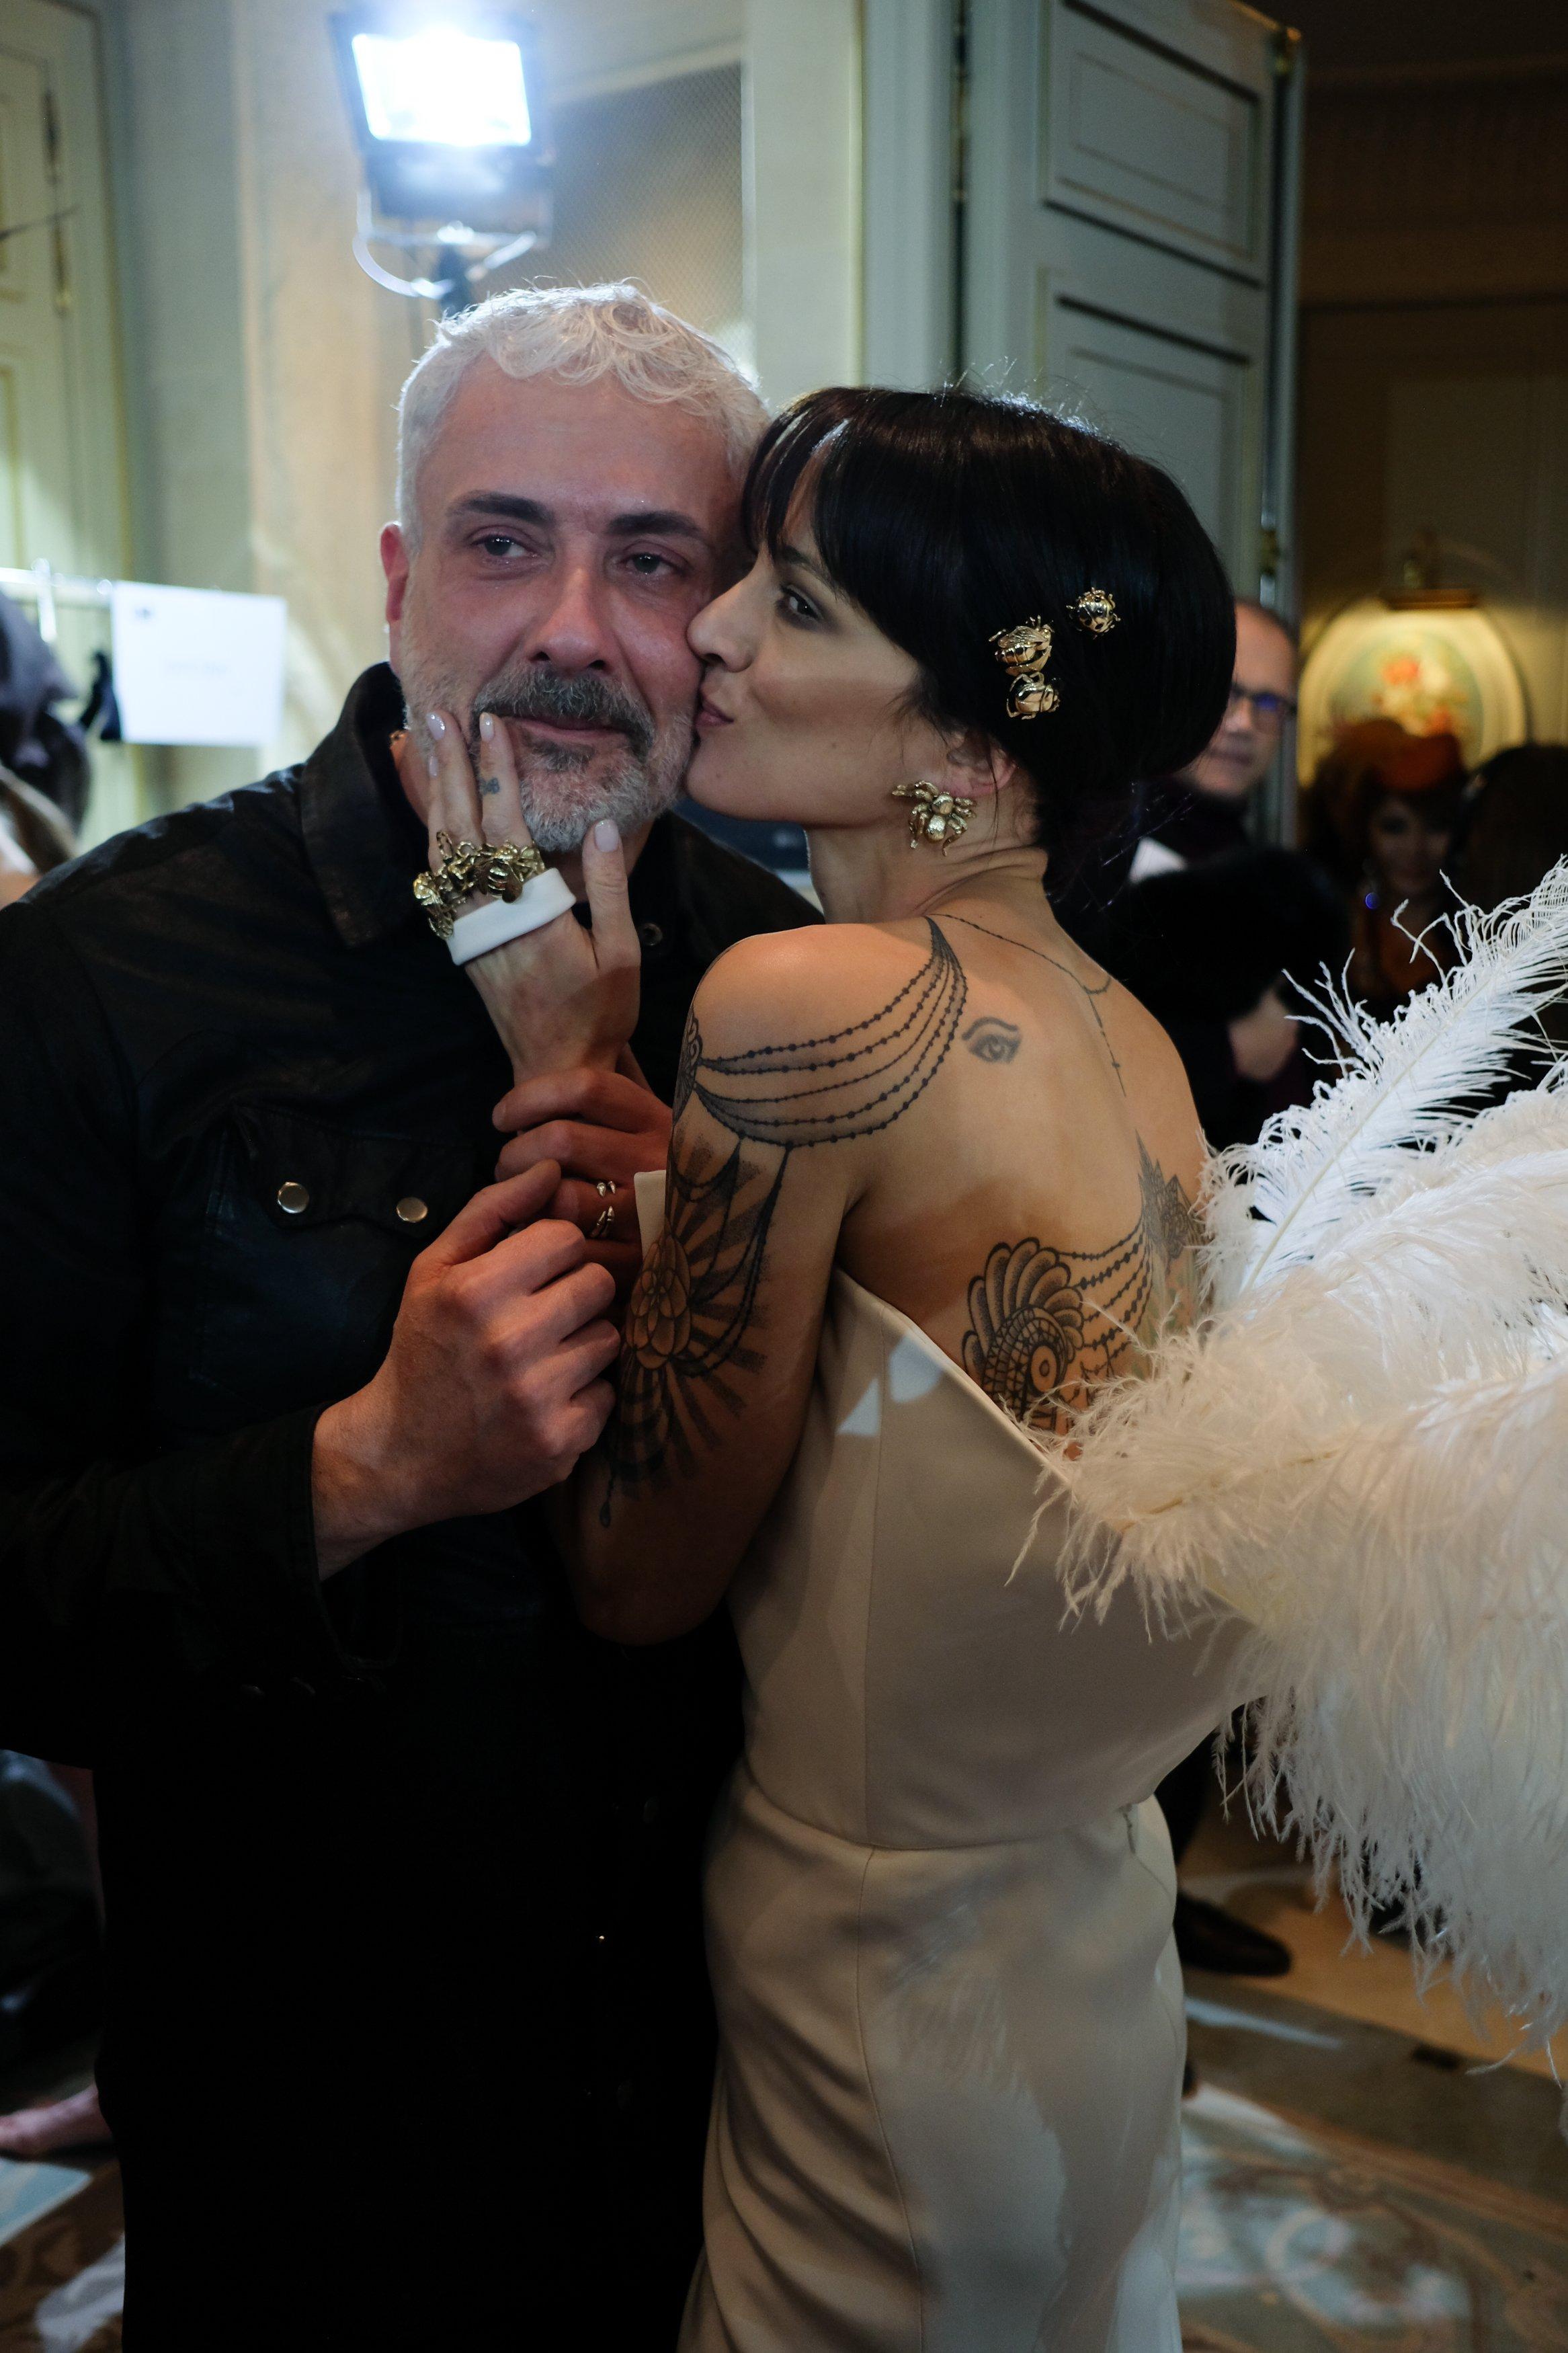 Asia Argento on catwalk for Antonio Grimaldi during Paris Fashion Week Picture by: Starface / SplashNews.com